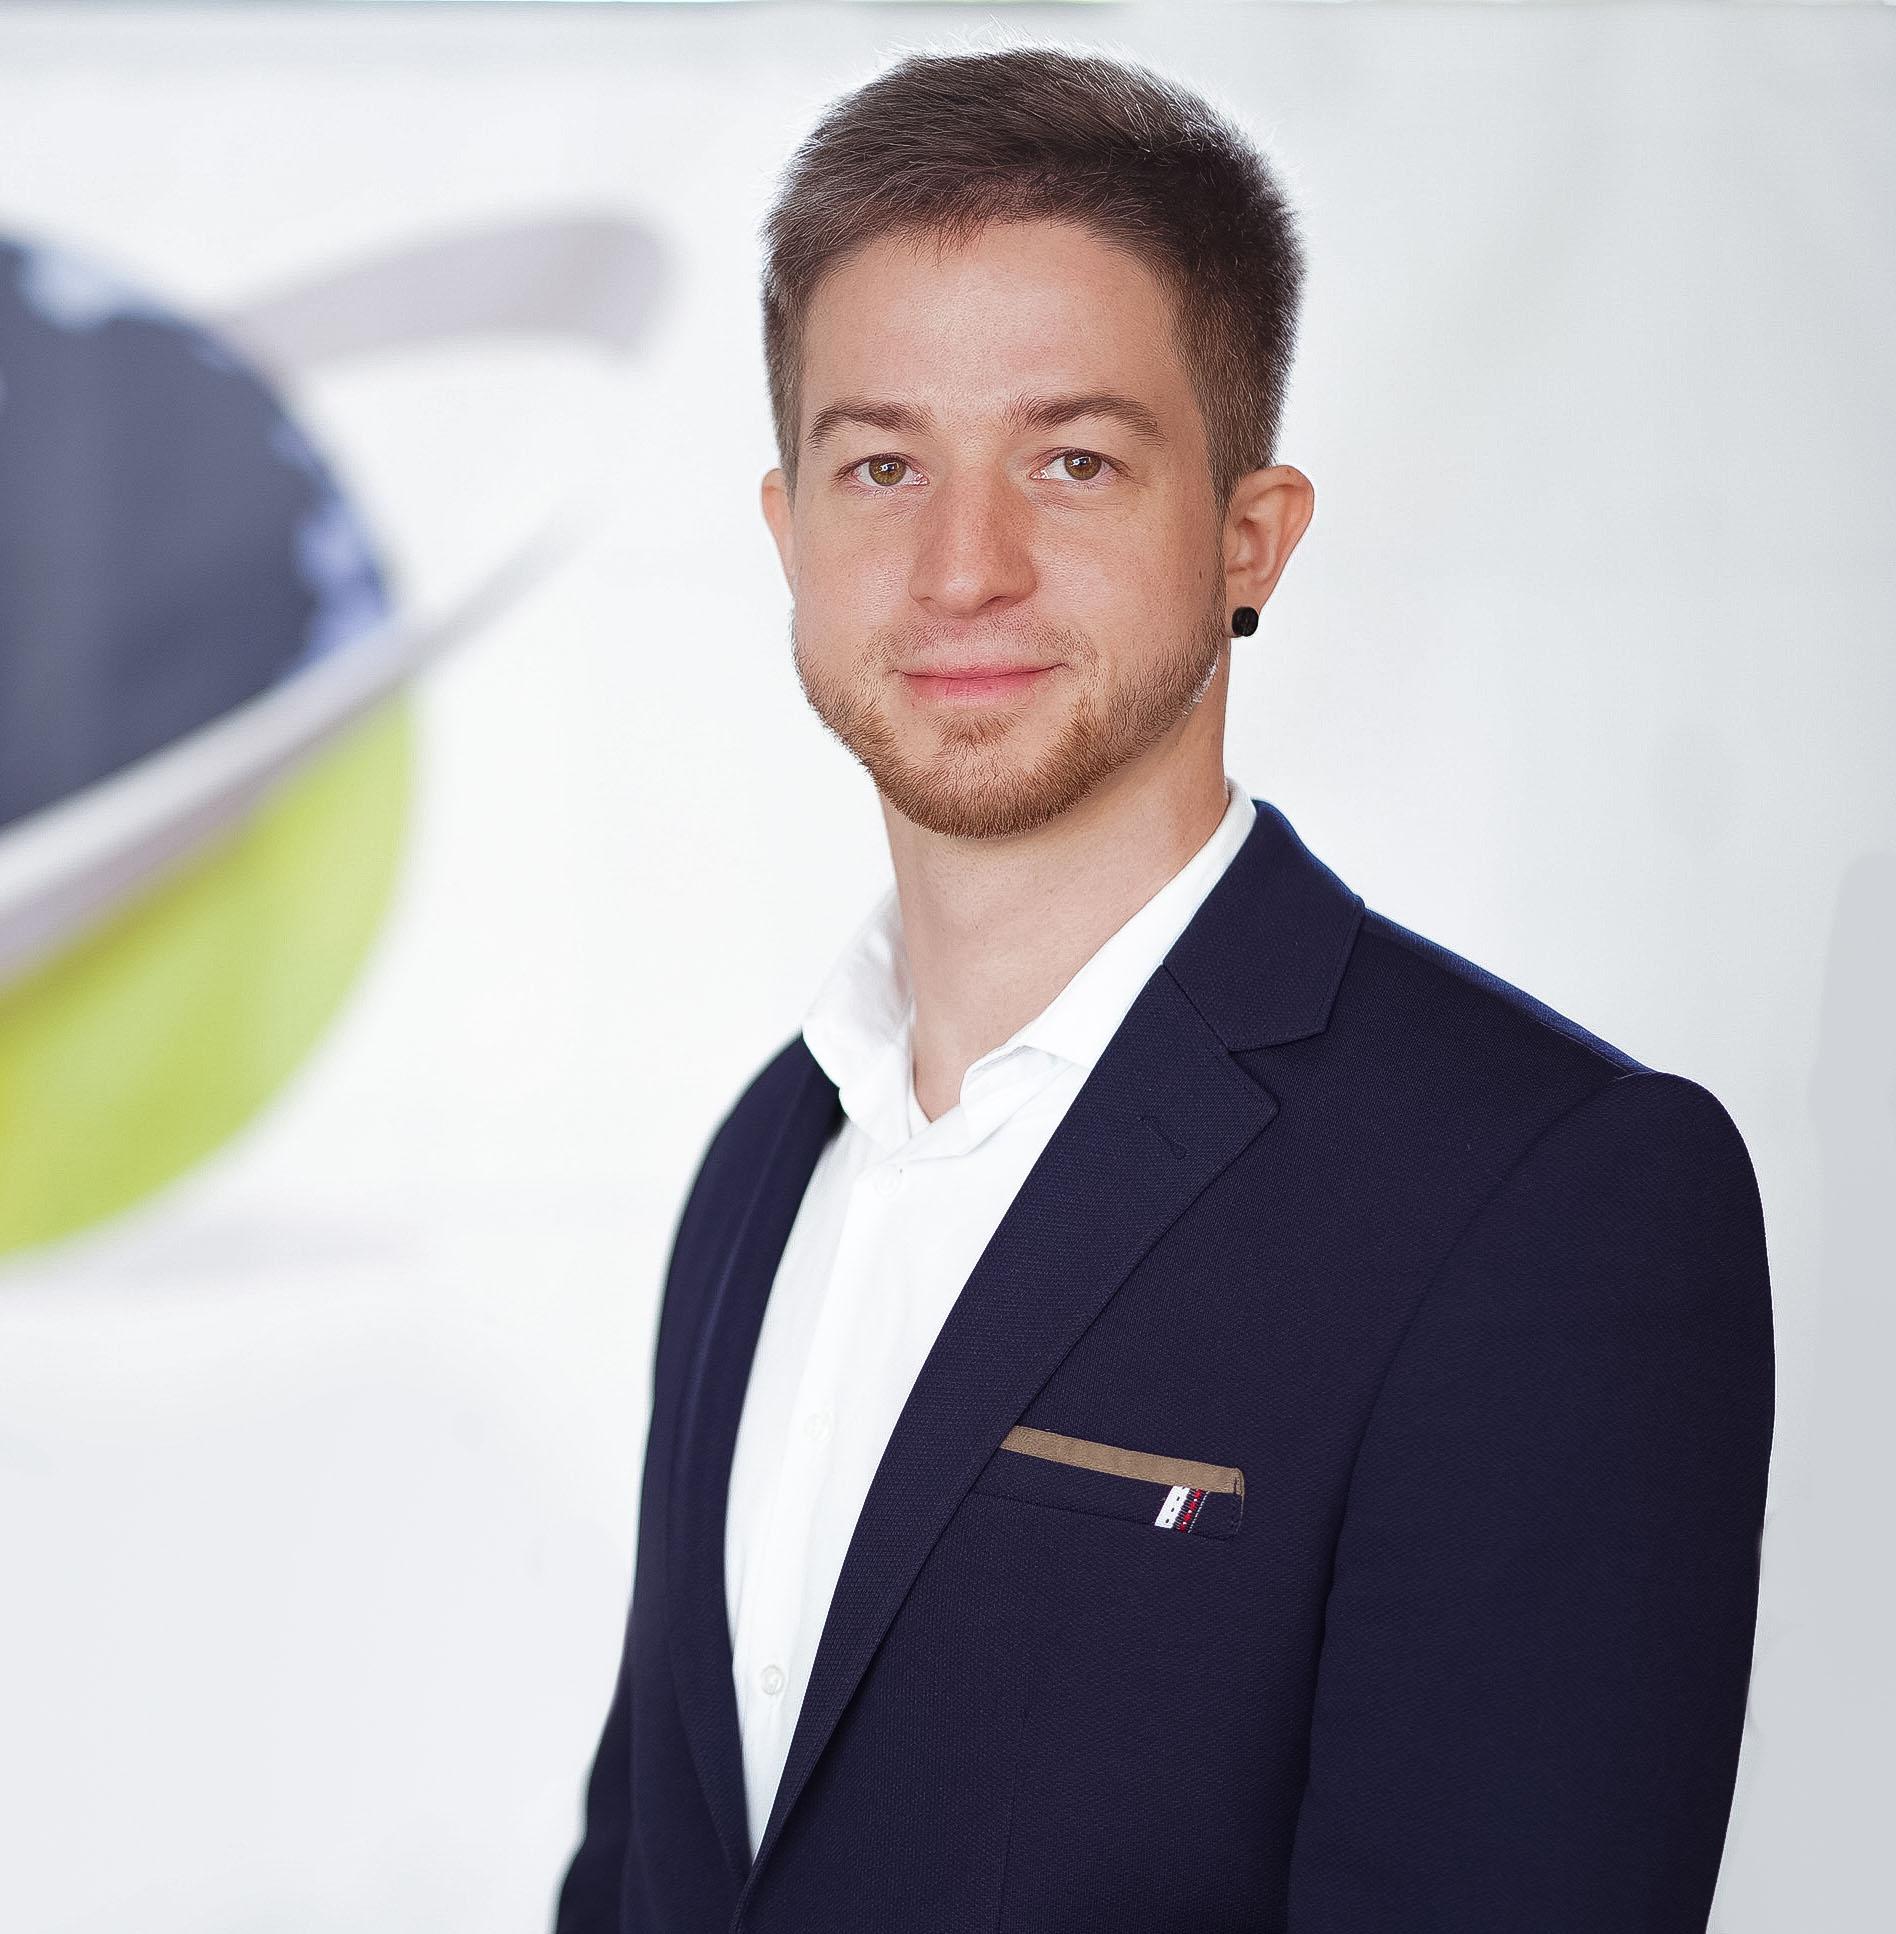 Marten-Richter-Bachelor-of-Electrical-Engineers_02.jpg